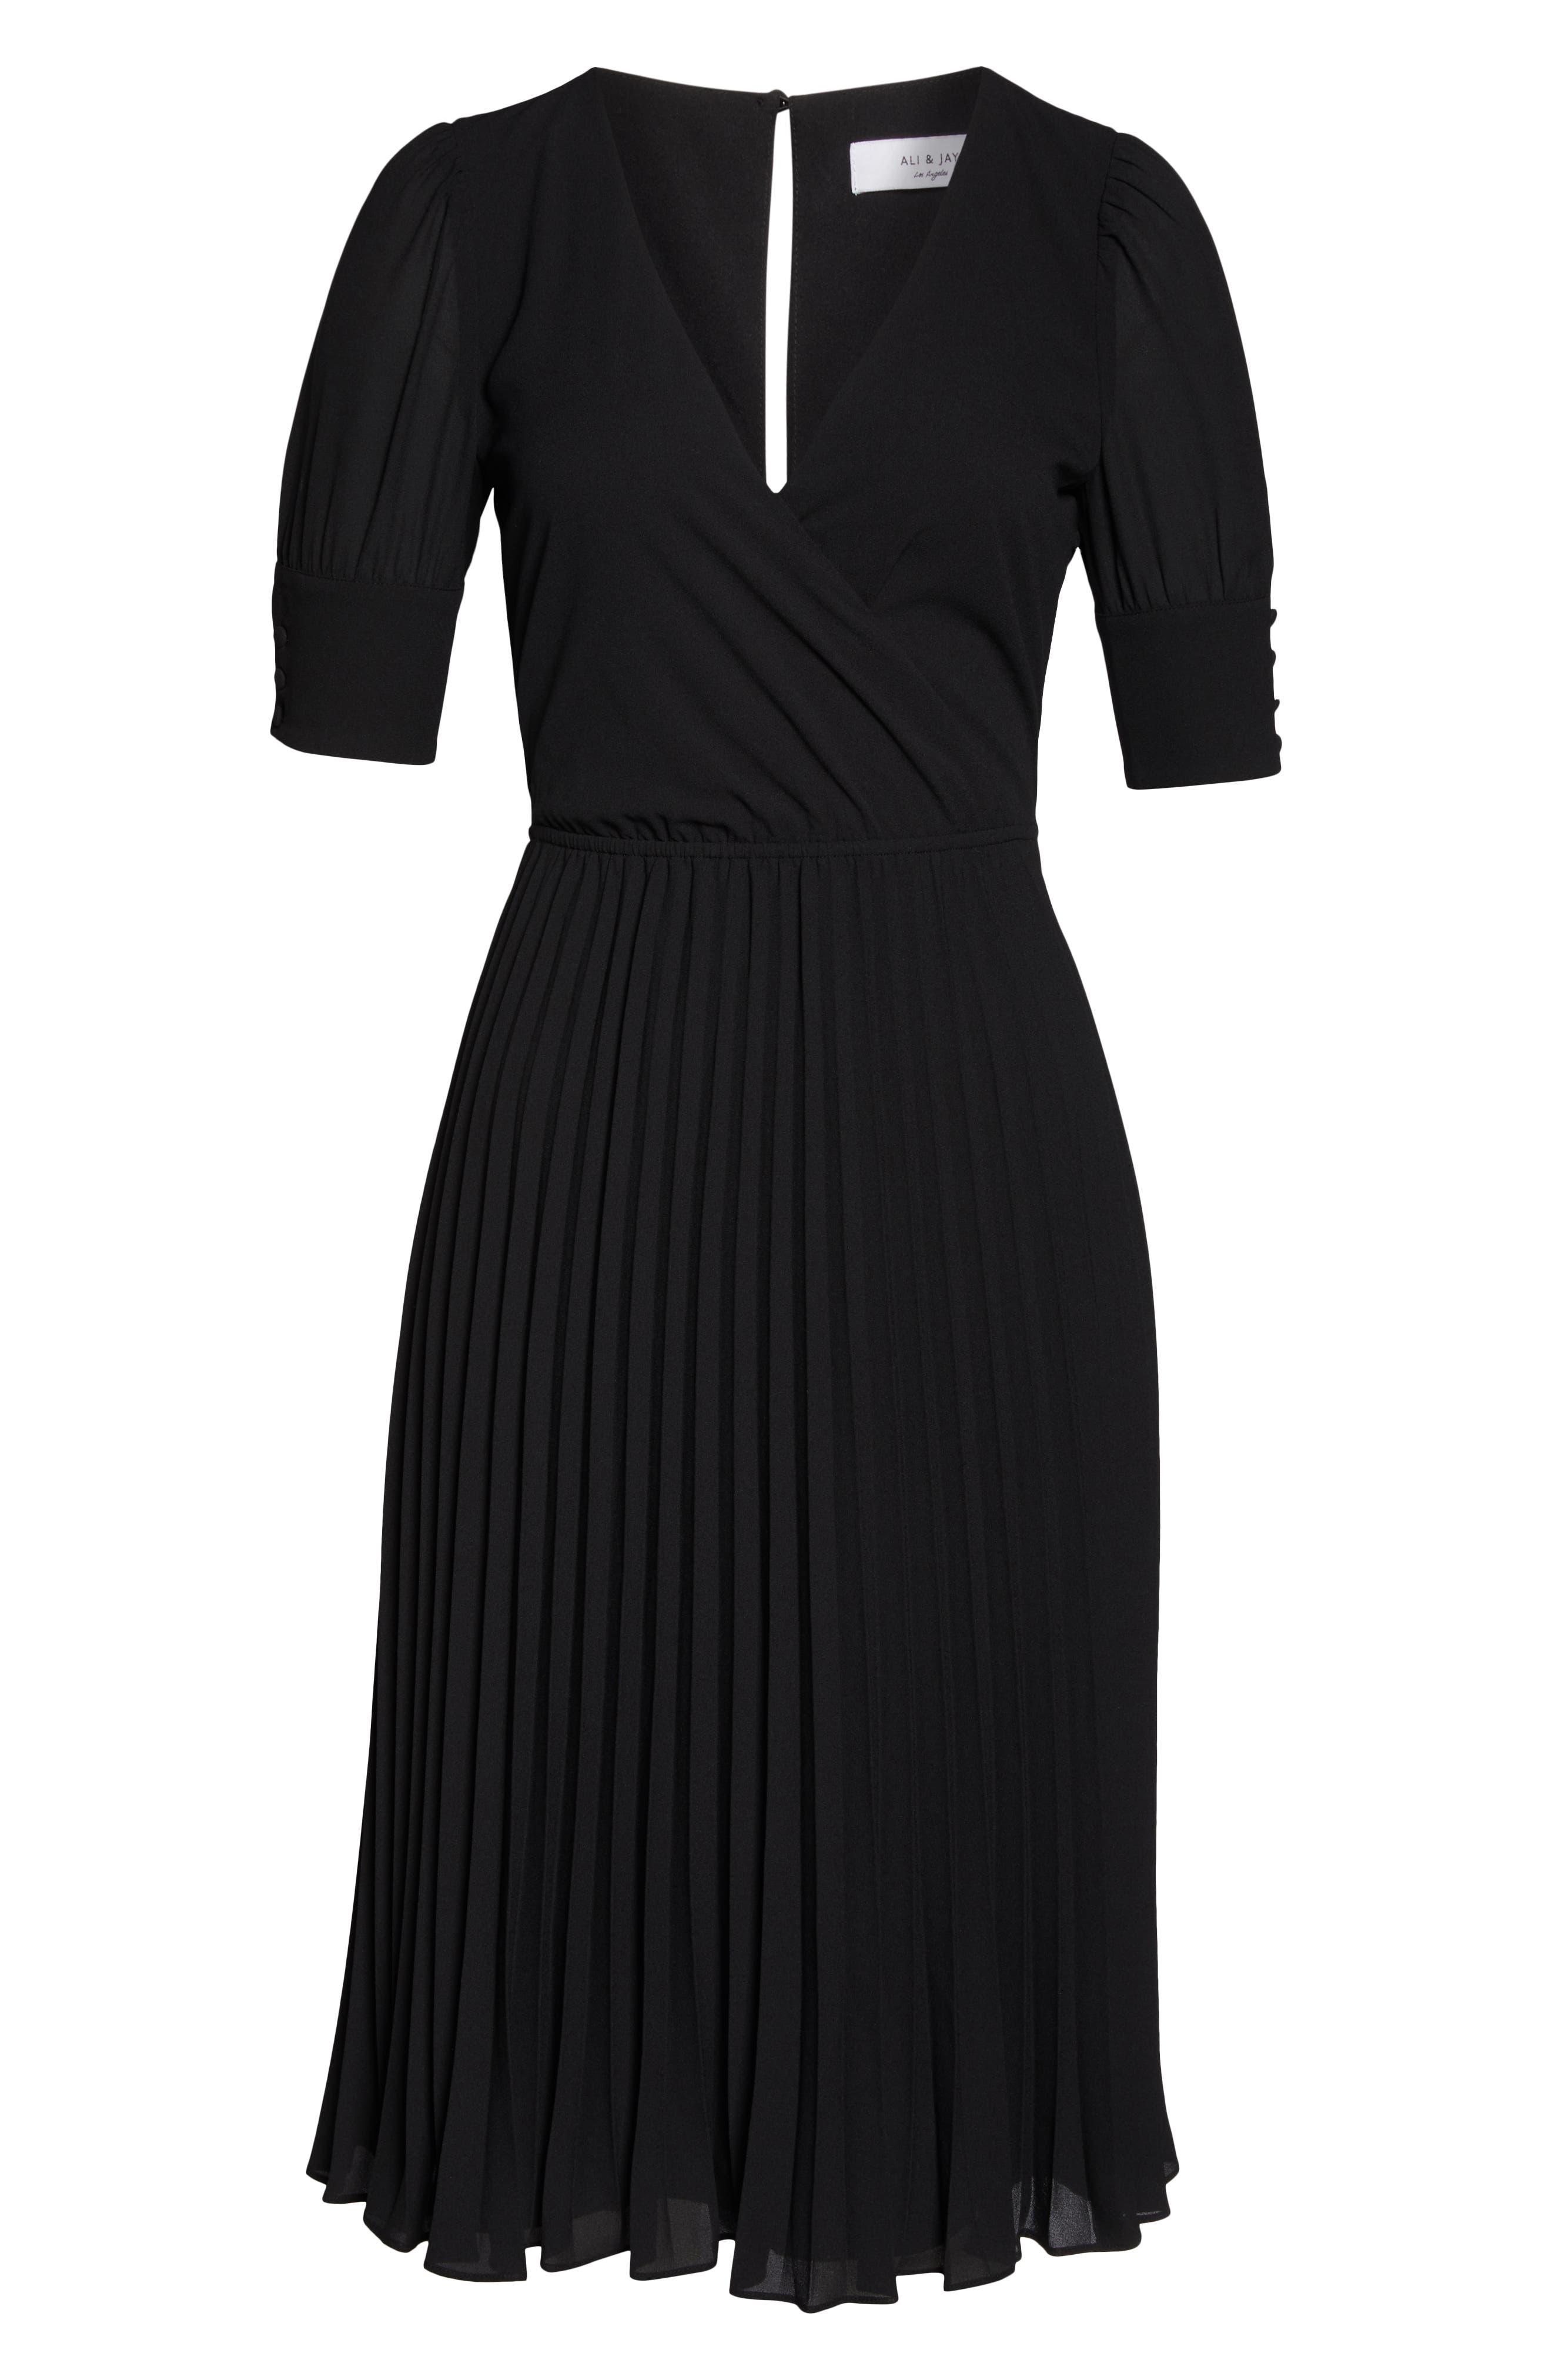 ALI & JAY, Angles Flight Chiffon Fit & Flare Dress, Alternate thumbnail 7, color, BLACK